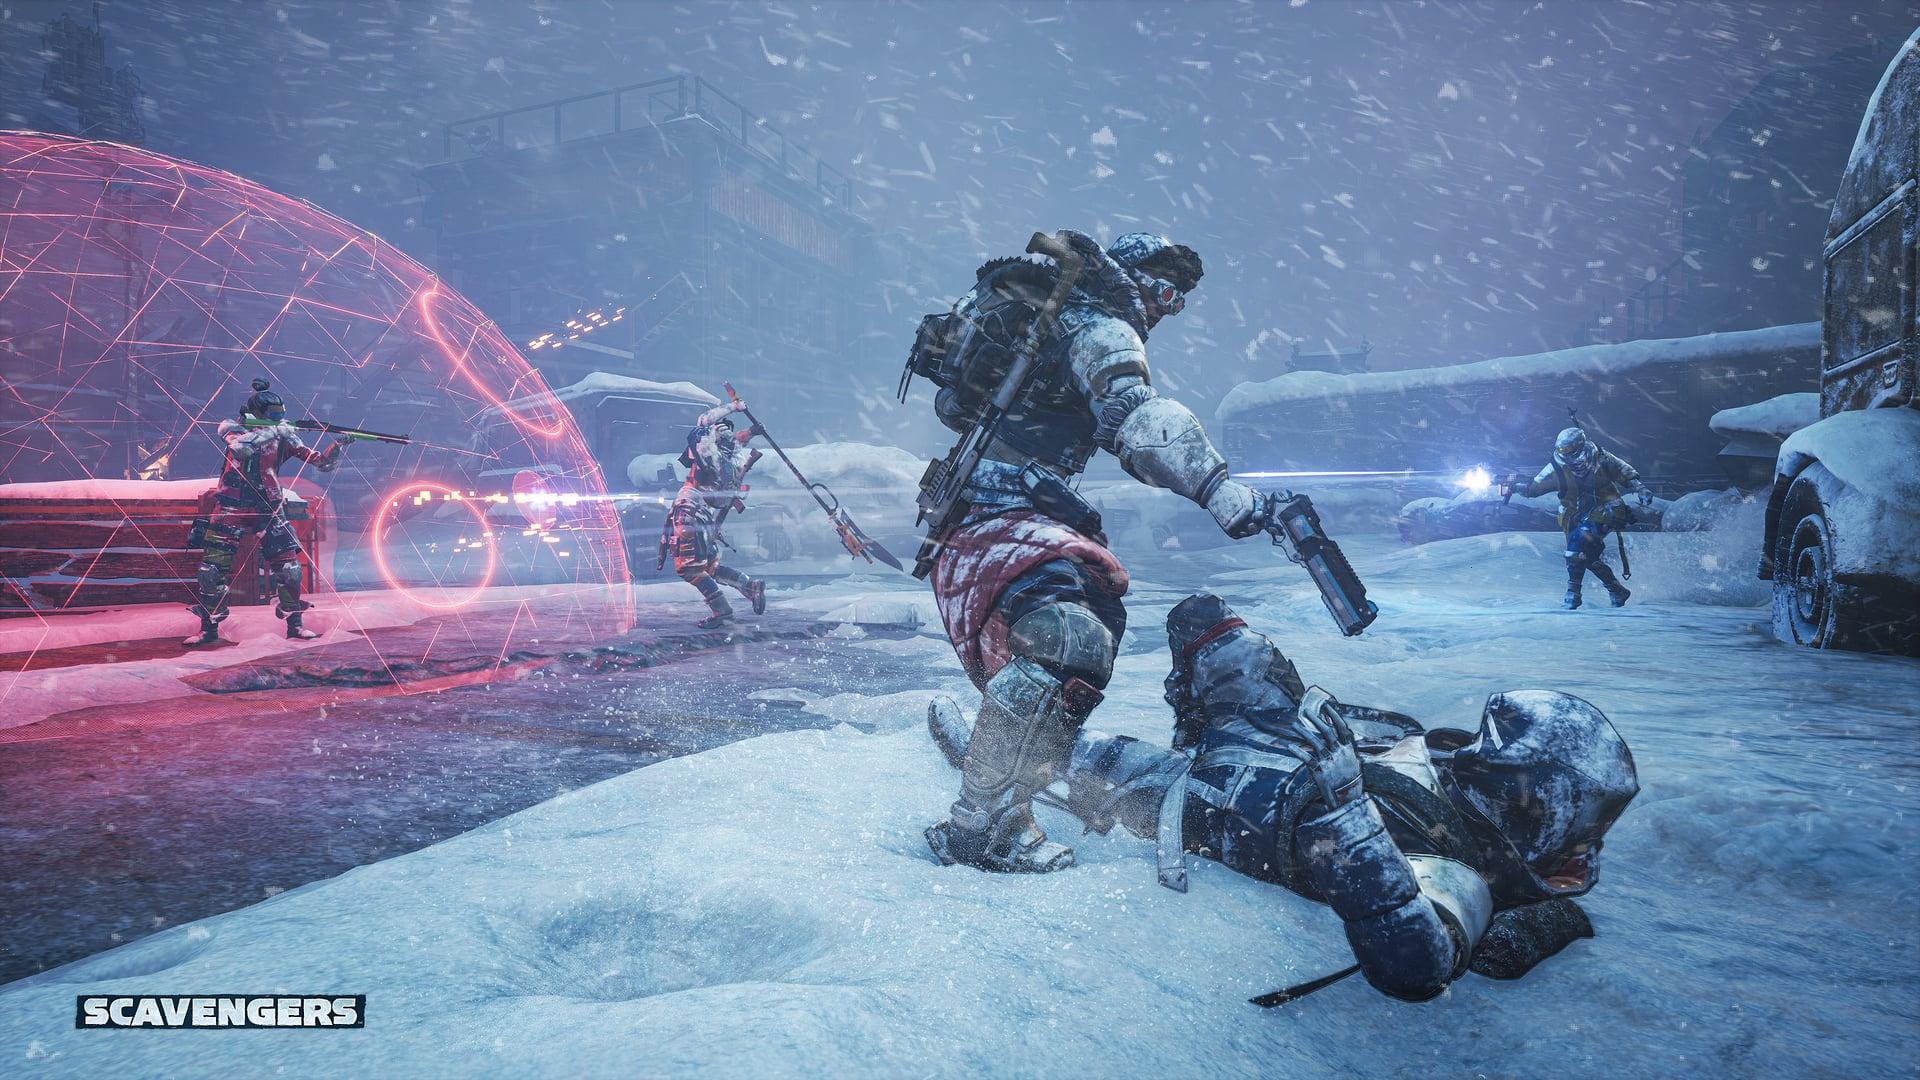 Scavengers Gameplay Screenshot Storm